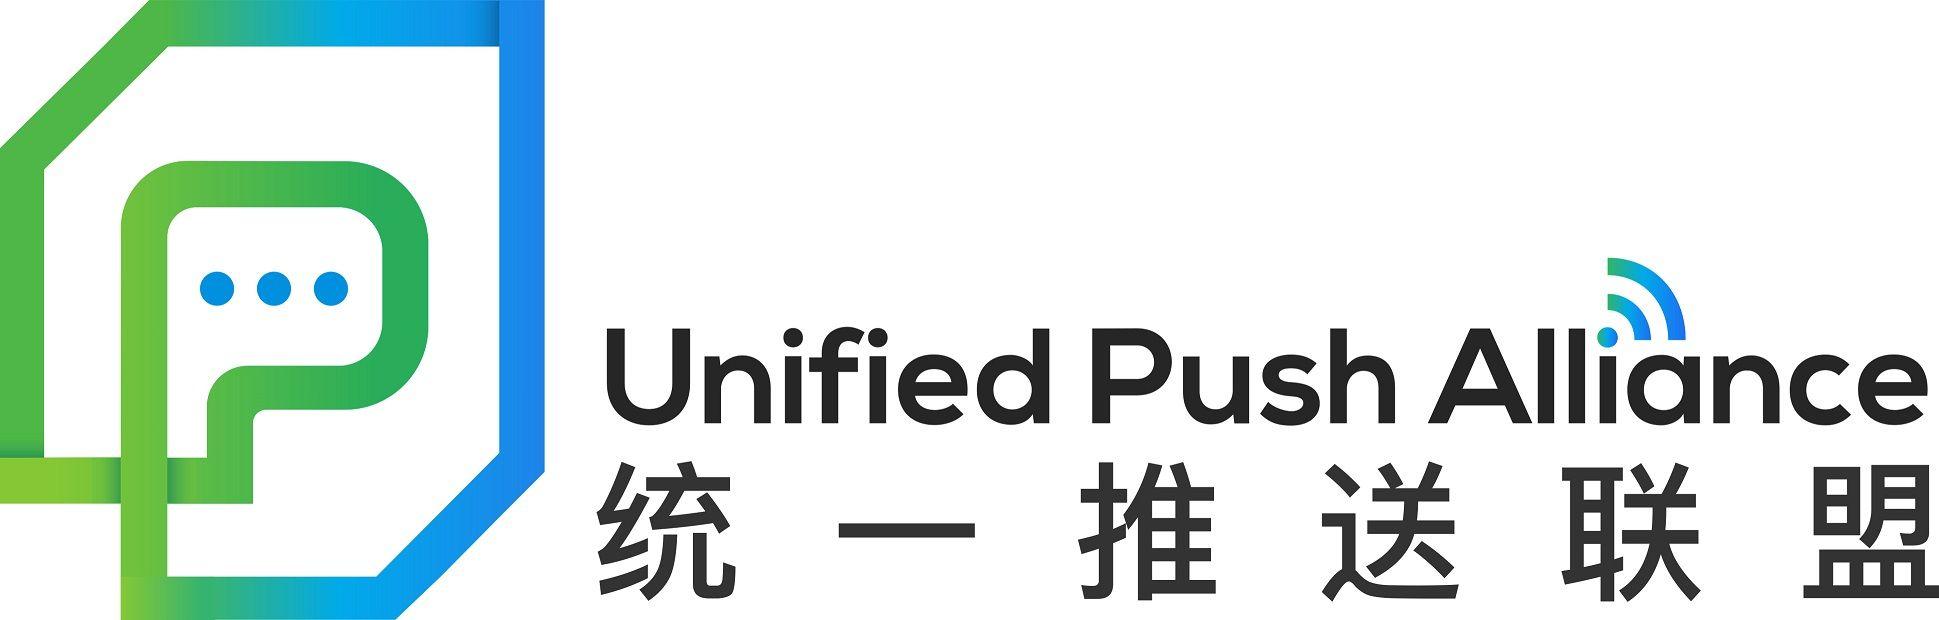 MeizuはUnified Push Allianceの理事、HuaweiやOPPOは副理事長